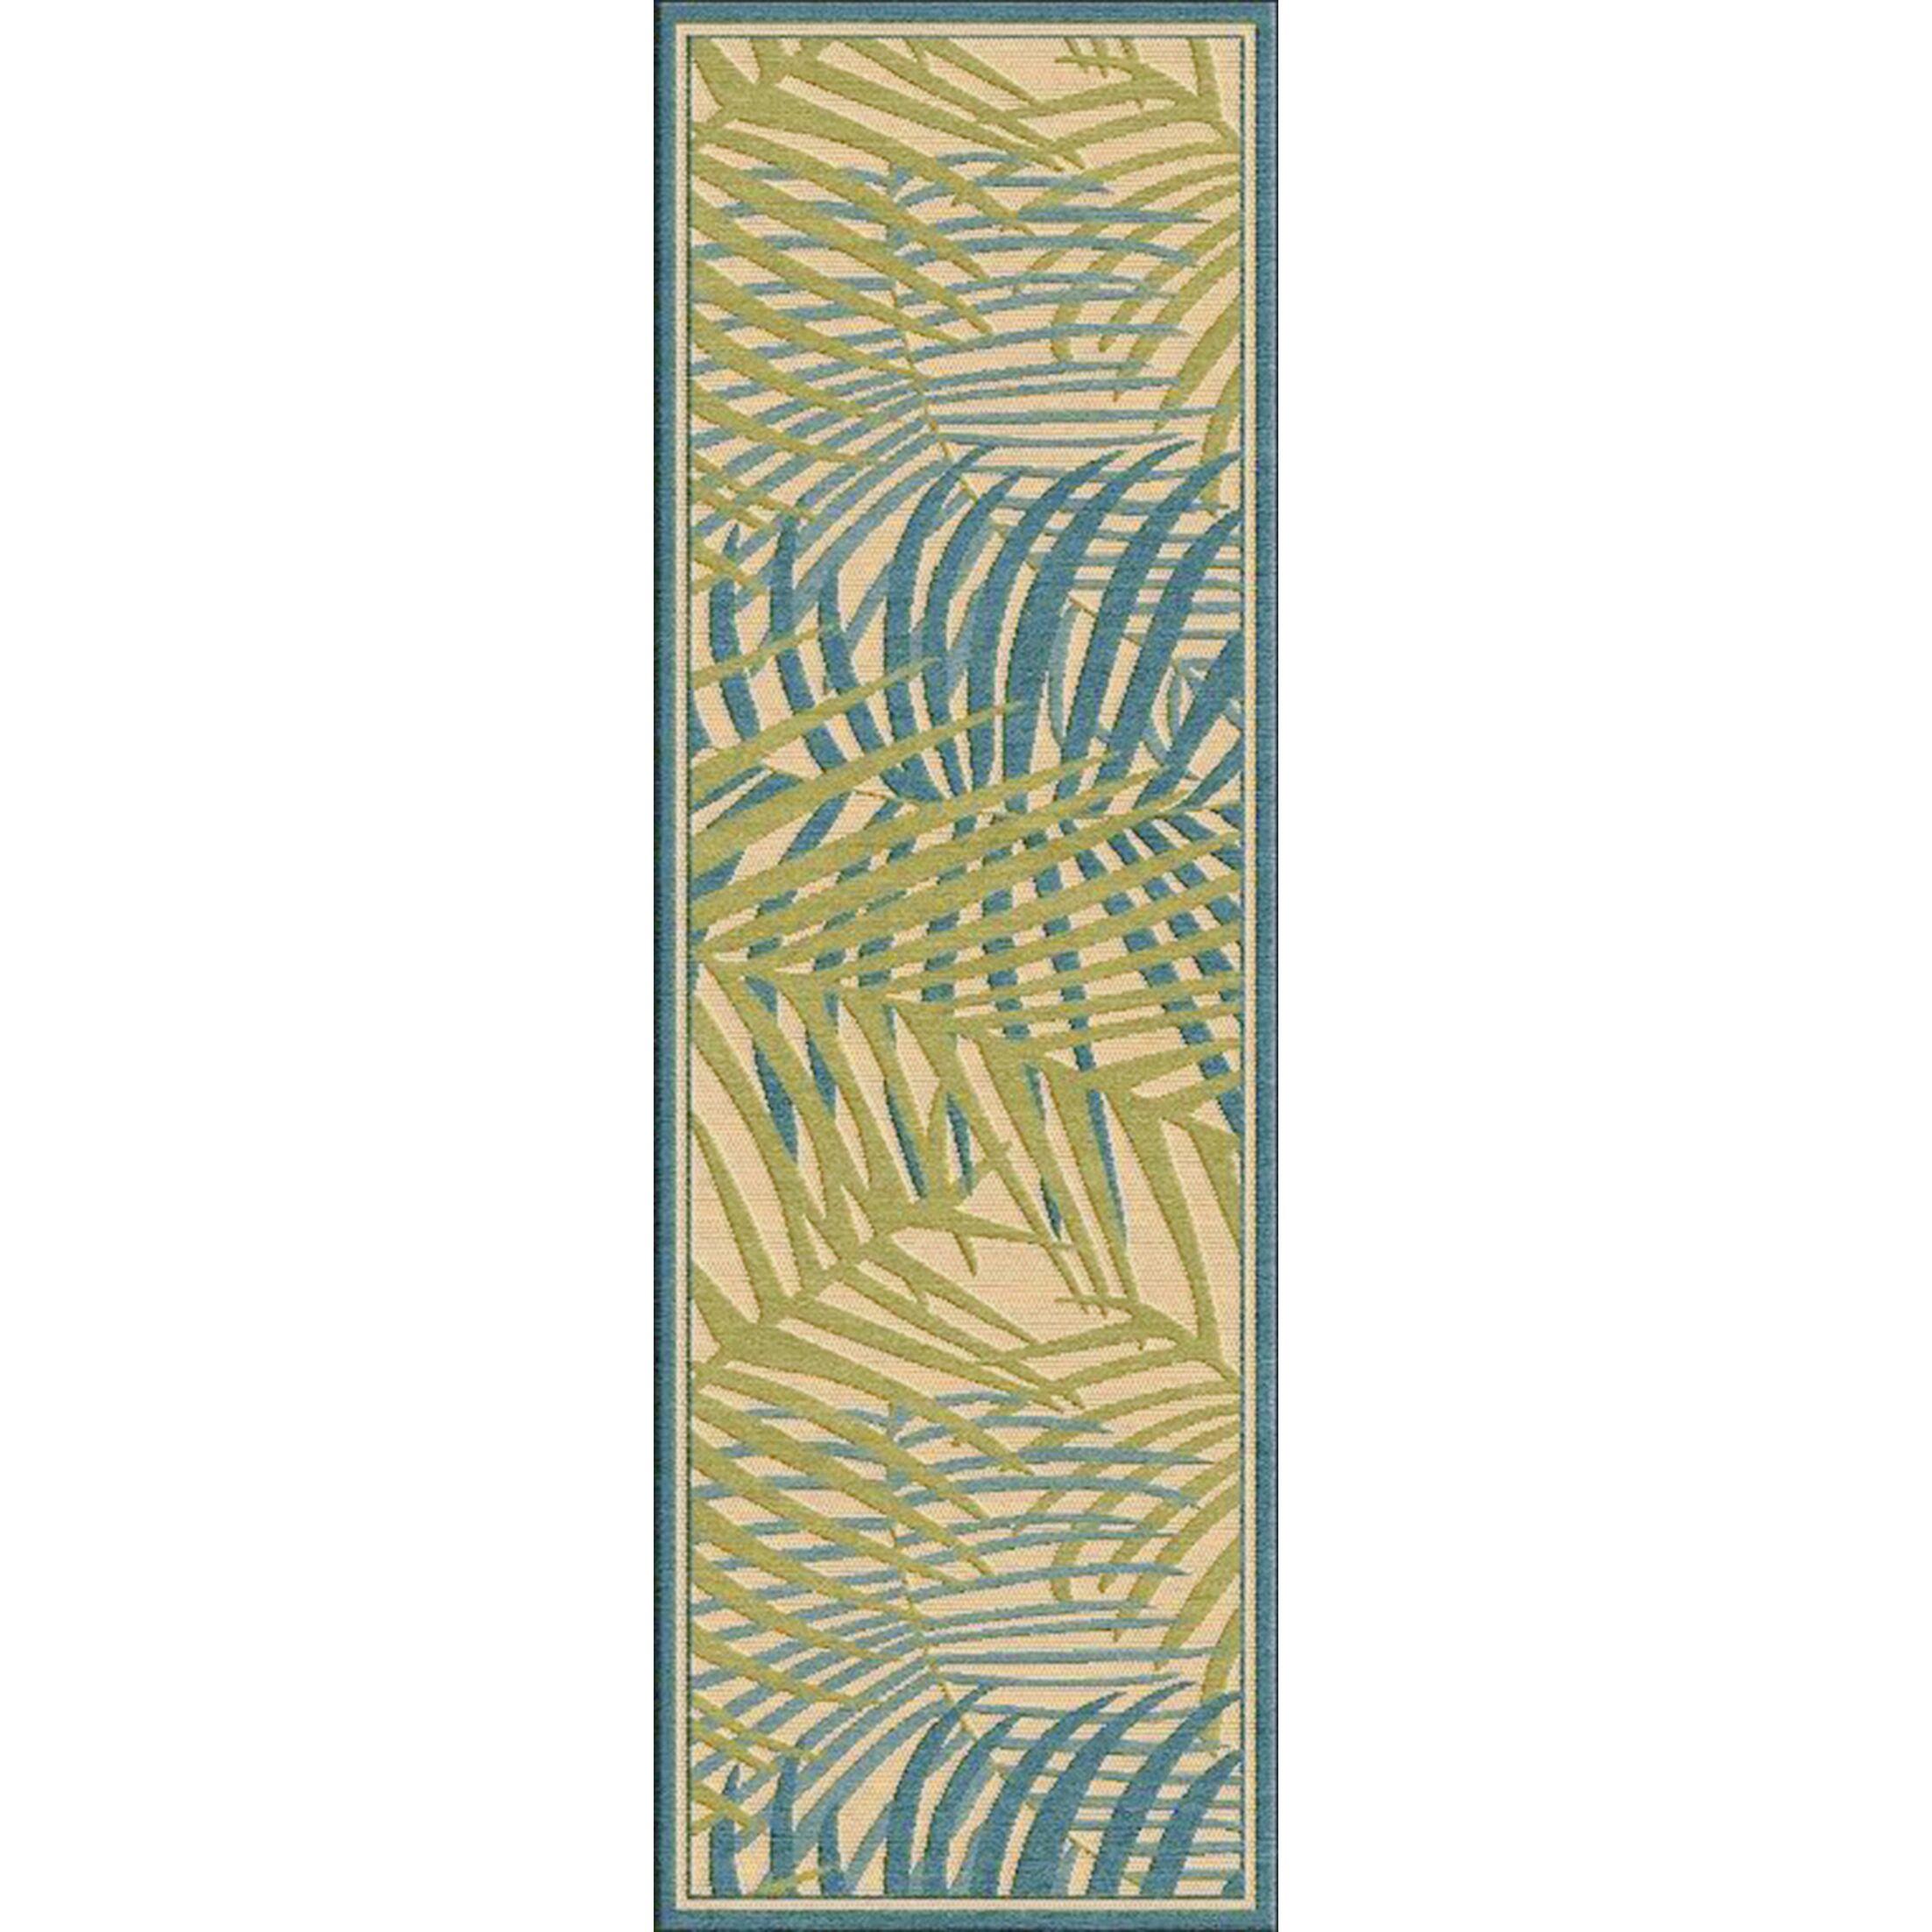 Caravel Khaki Indoor/Outdoor Area Rug Rug Size: Rectangle 8'8